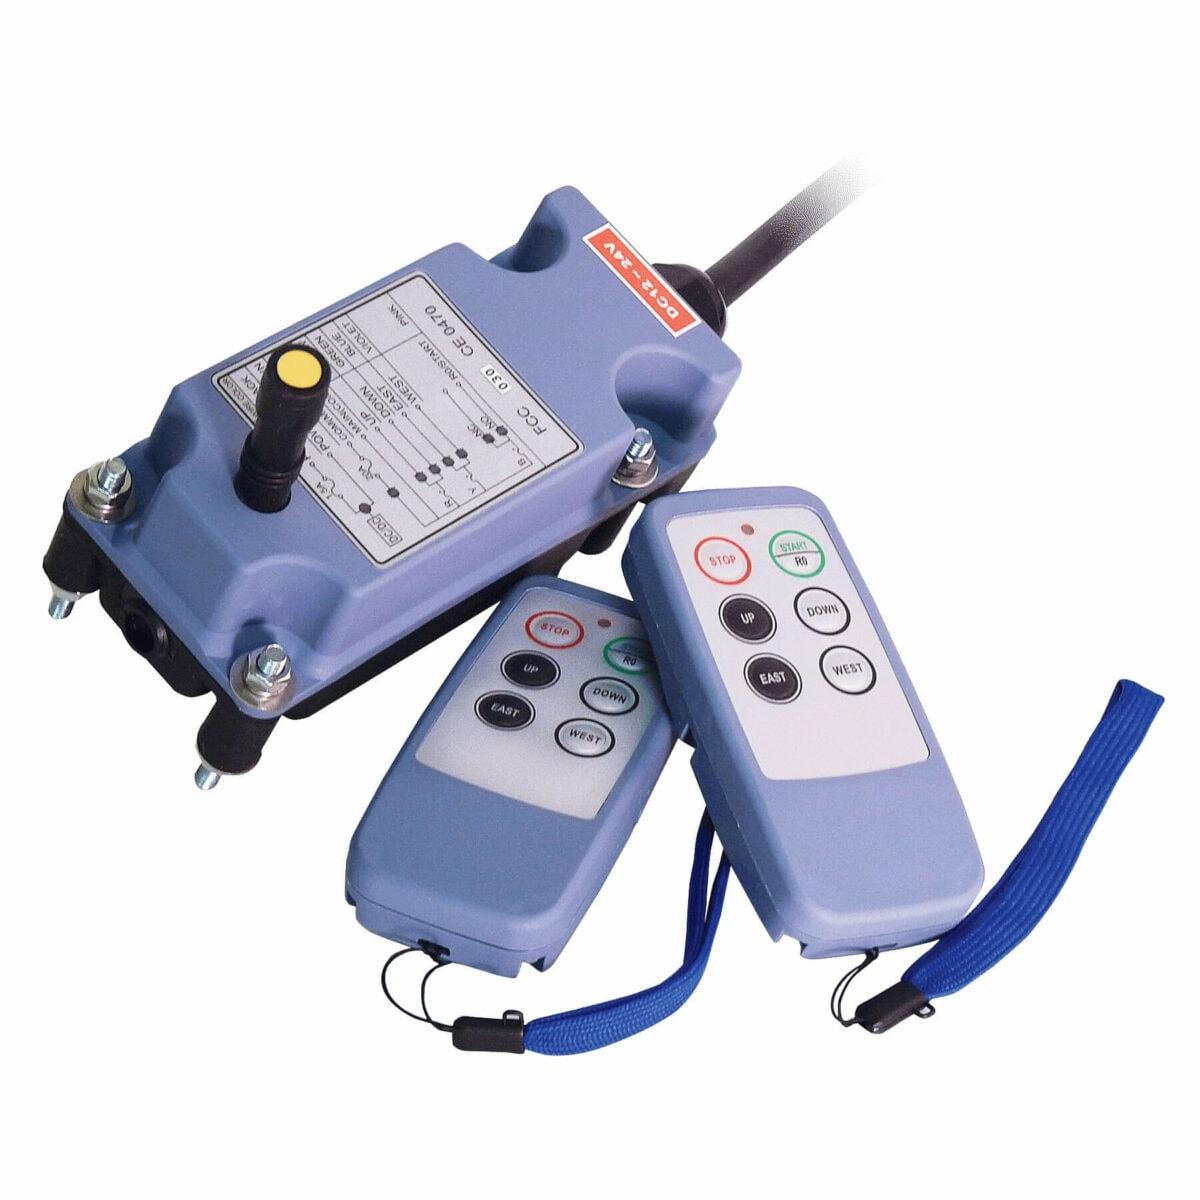 INMOTION Pocket Radio Remote Control